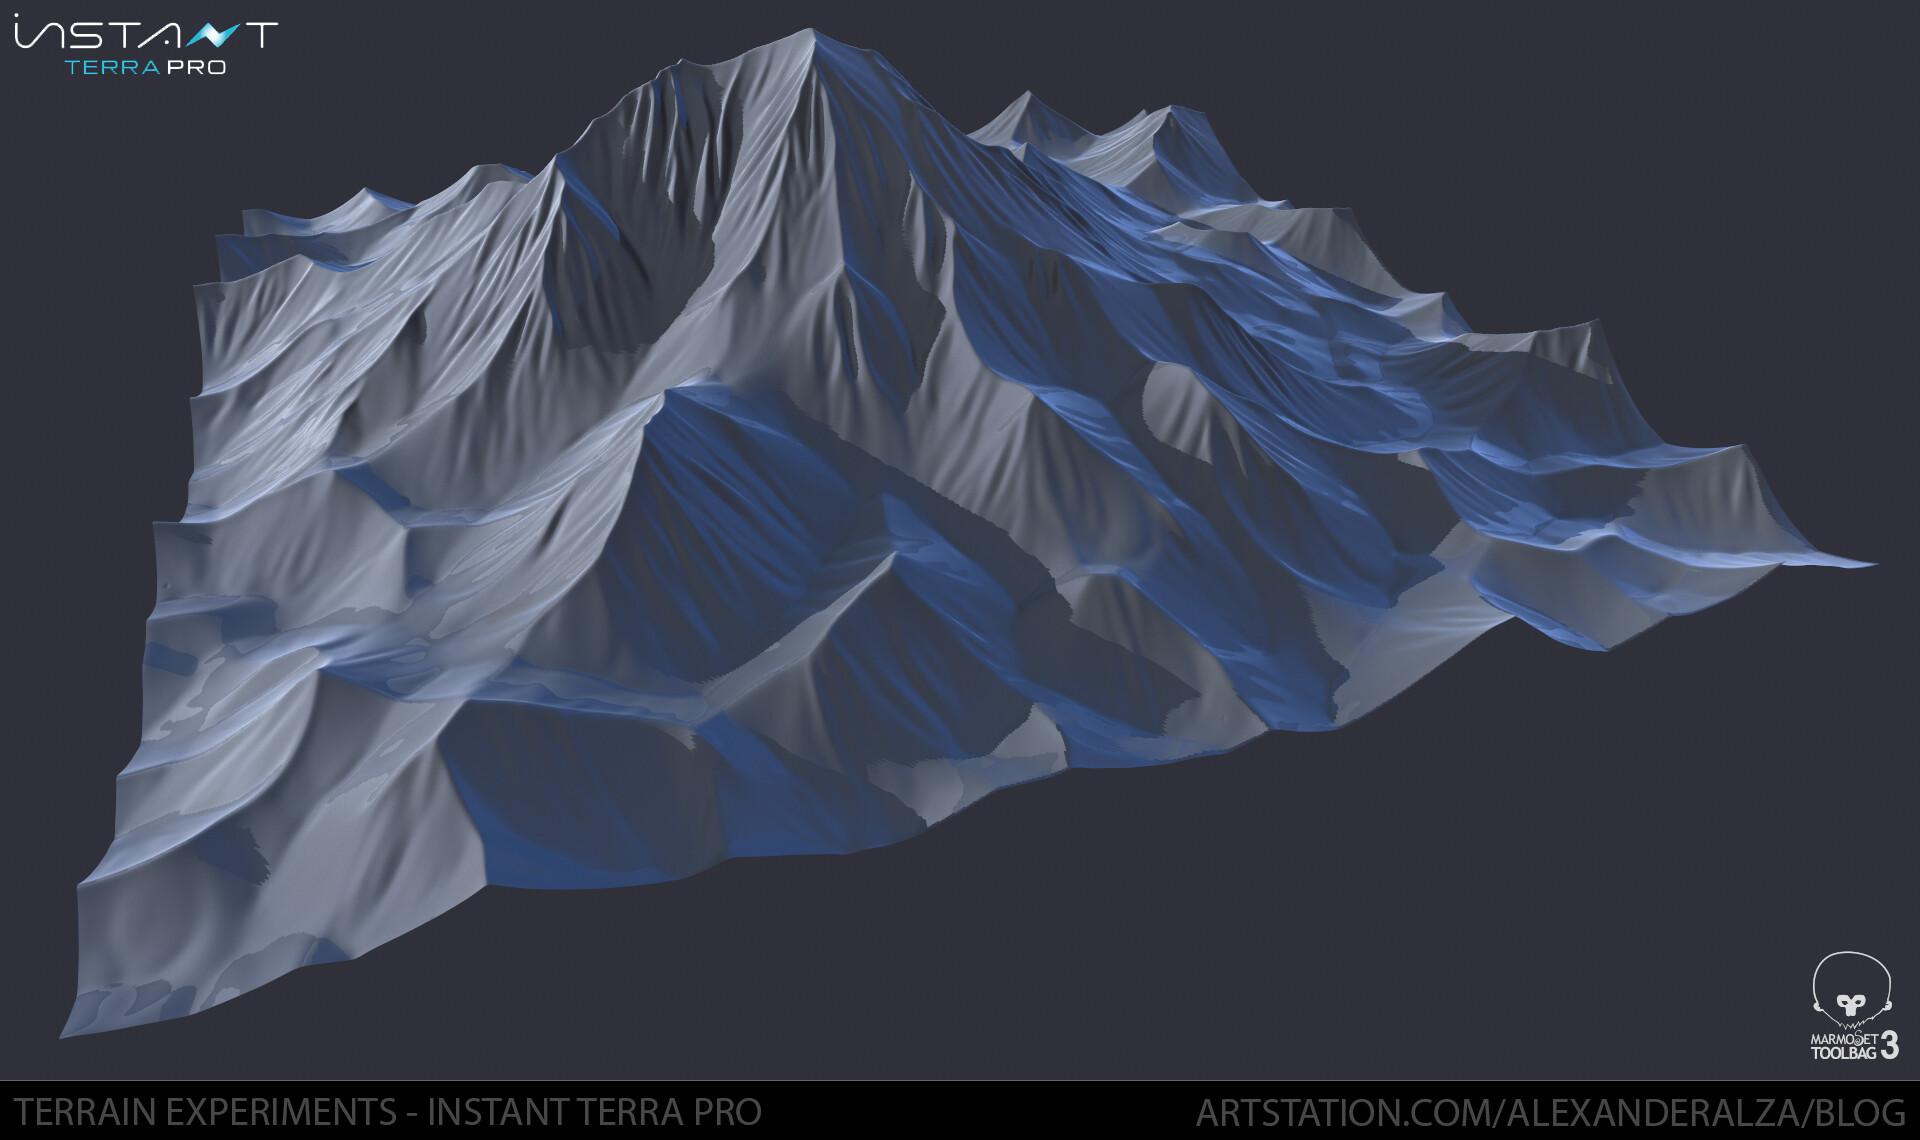 ArtStation - Alexander Alza - Terrain experiments using